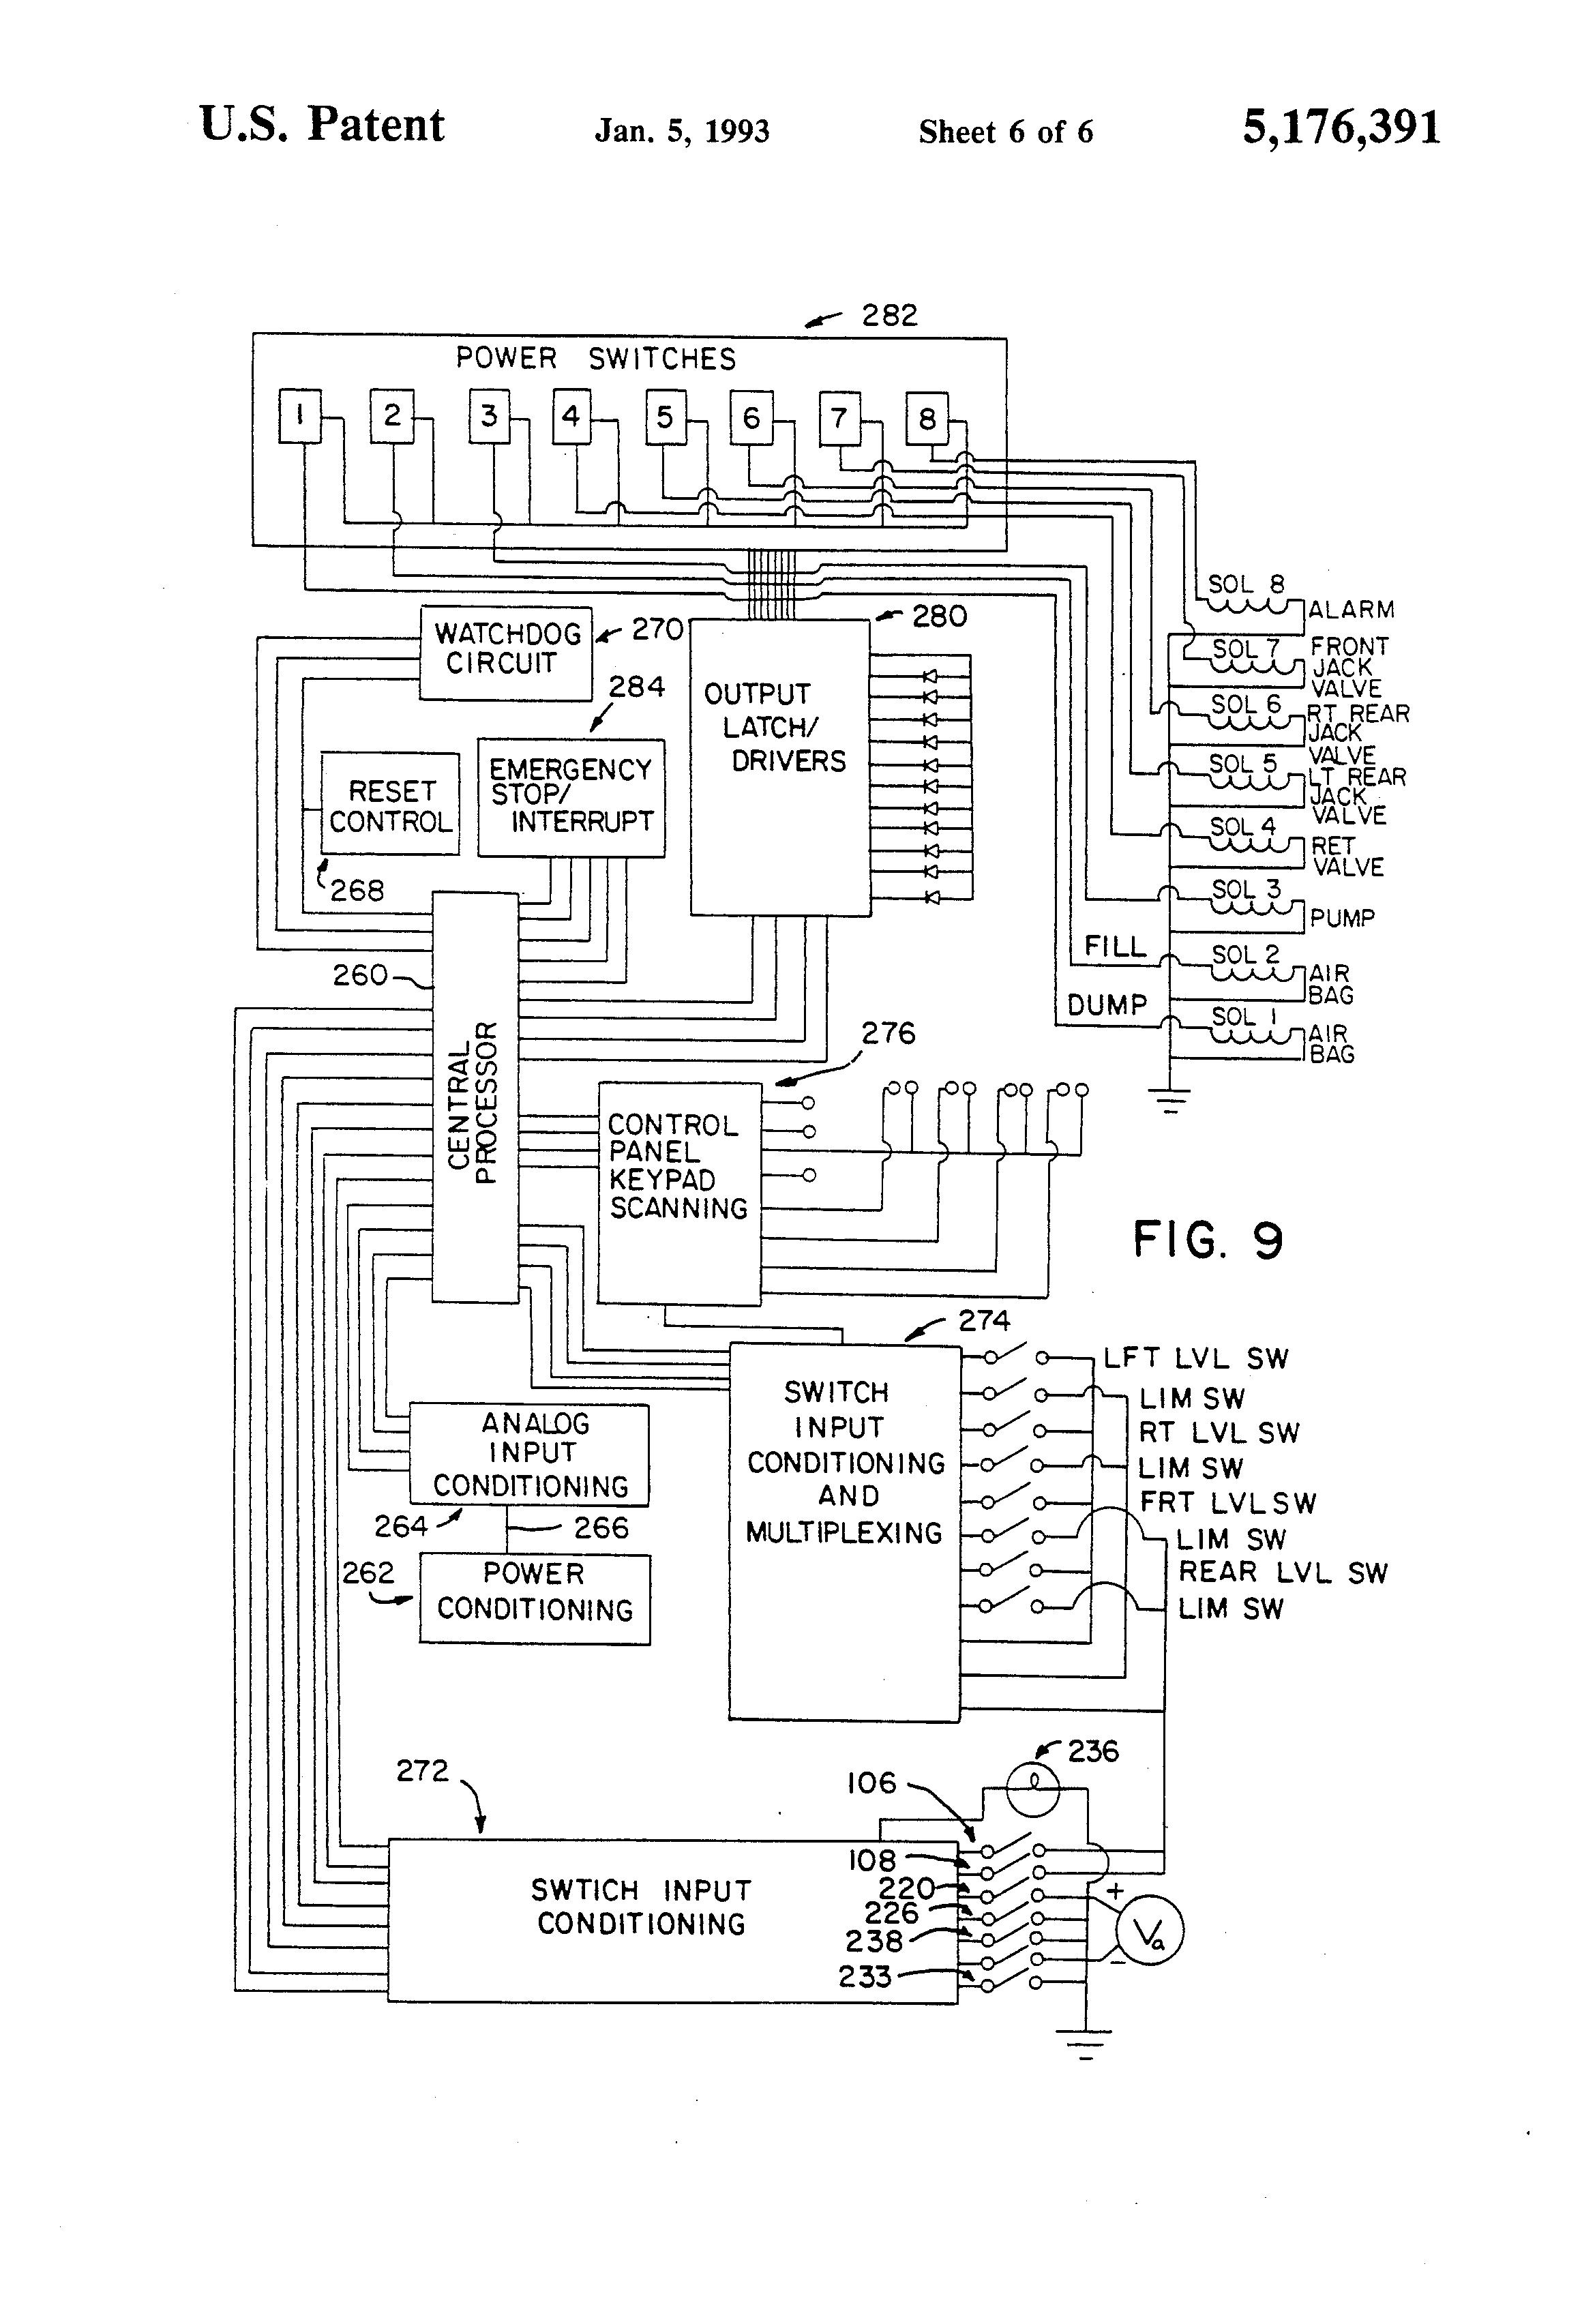 hydraulic bale spike wiring diagram hydraulic leveling jacks wiring diagram patent us5176391 - vehicle leveling system - google patents